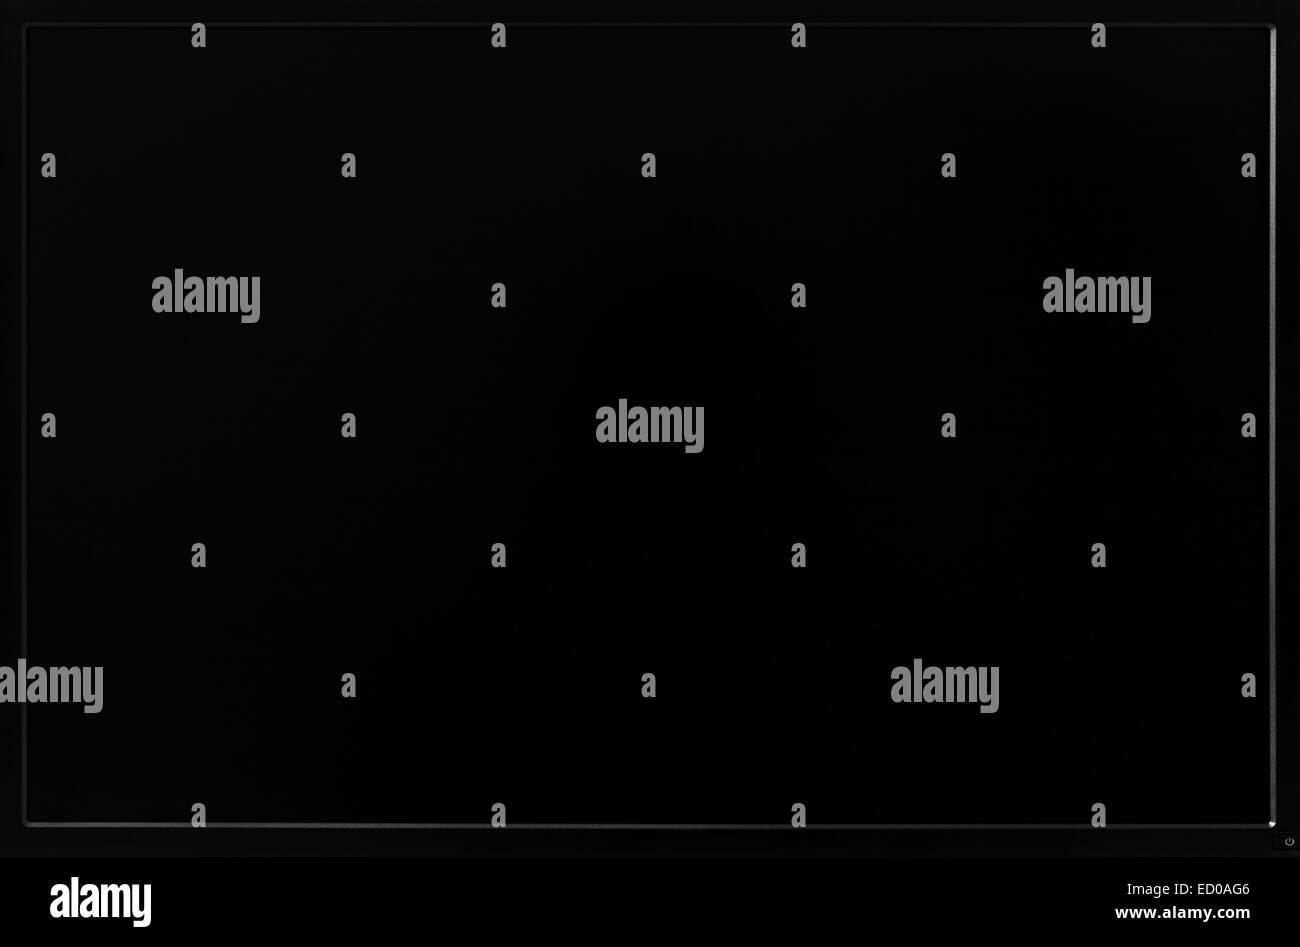 Photo of black LCD computer monitor screen. - Stock Image